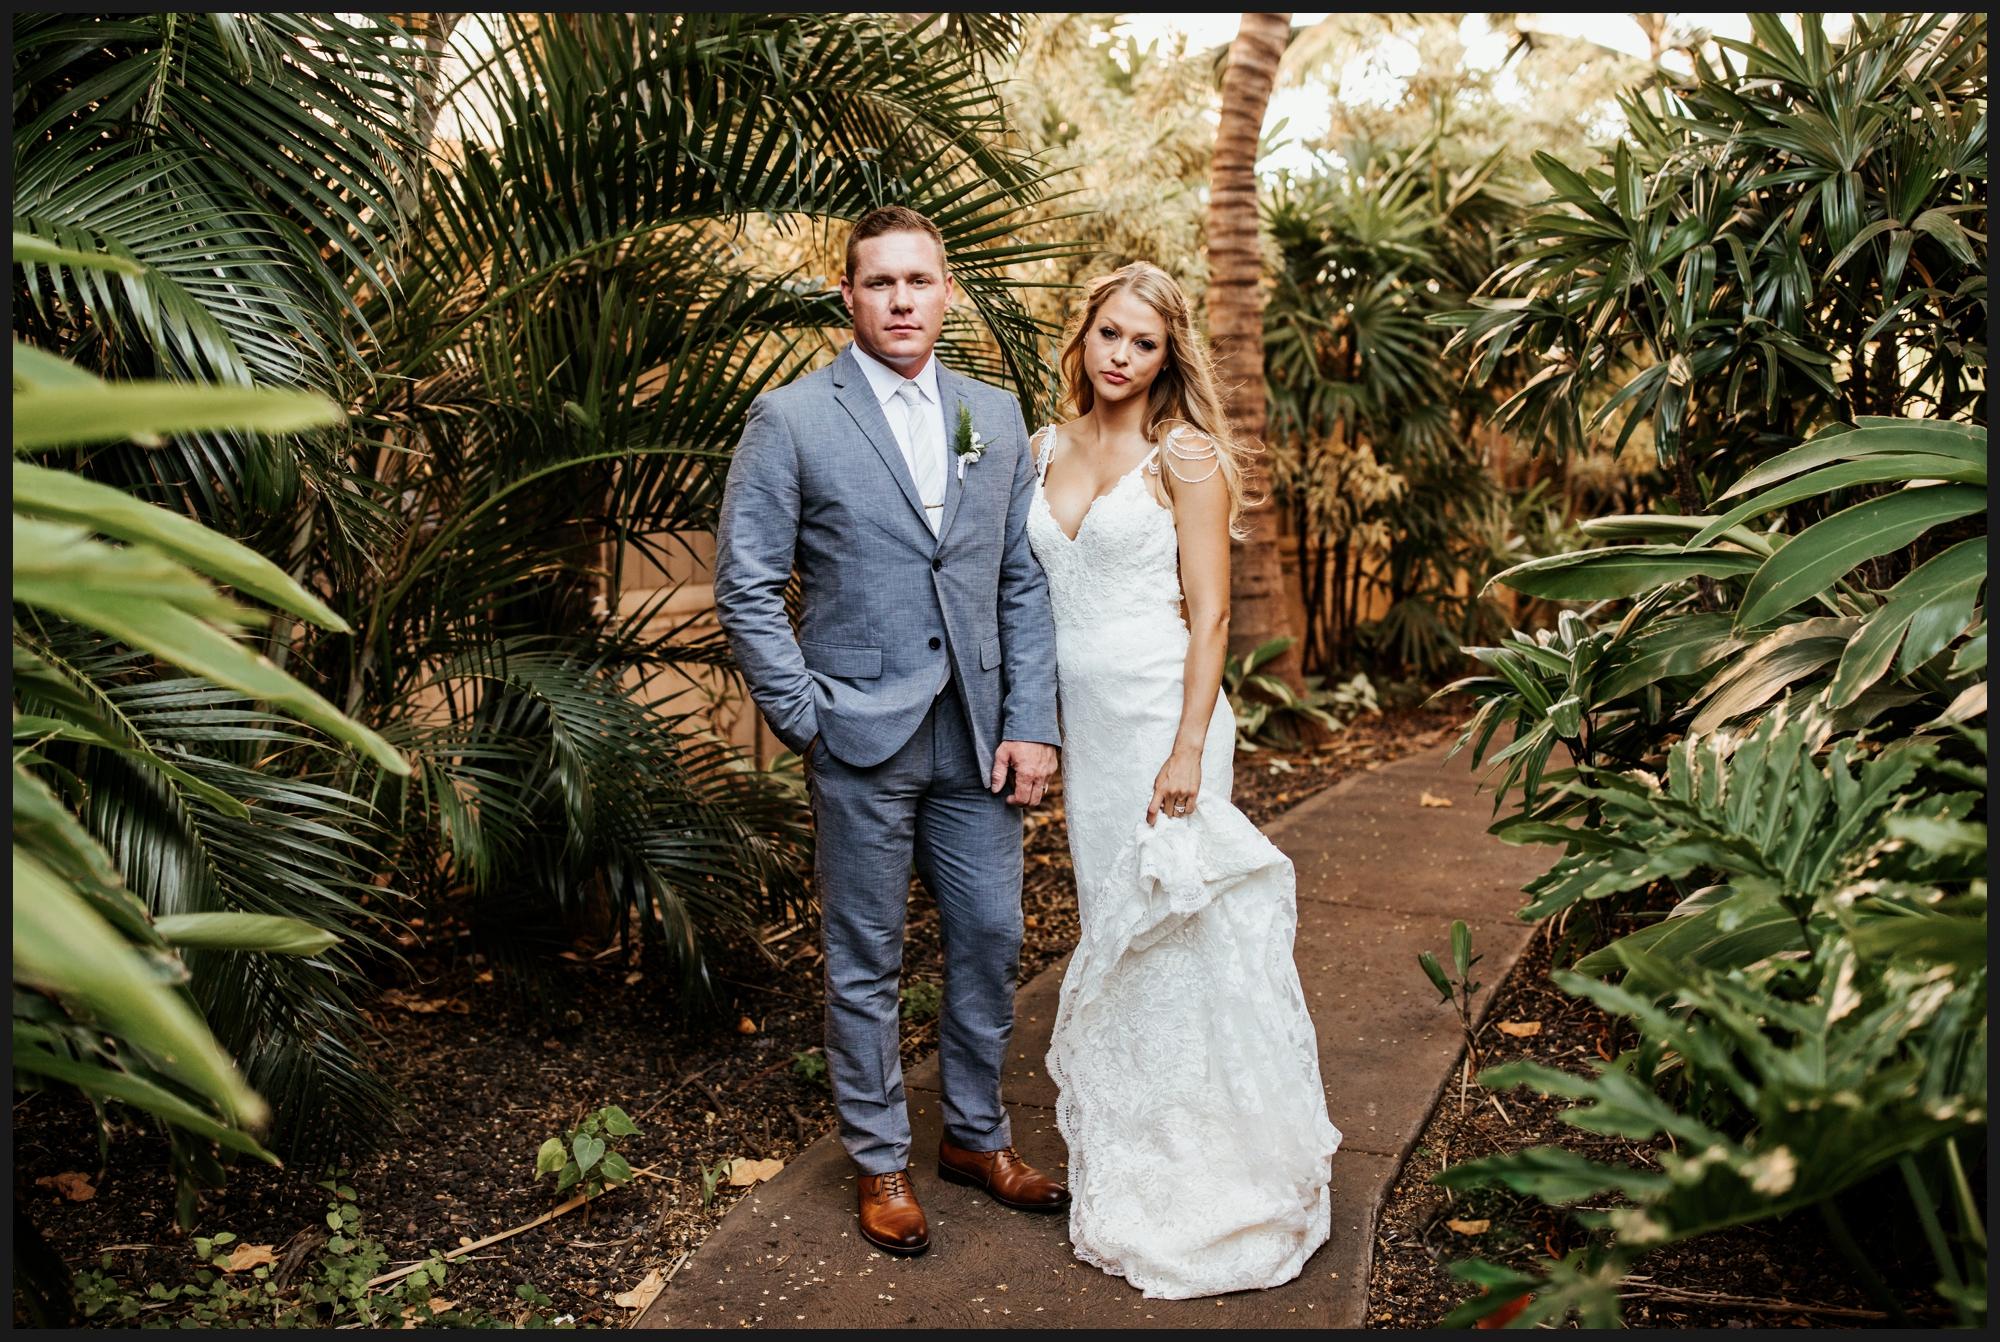 Orlando-Wedding-Photographer-destination-wedding-photographer-florida-wedding-photographer-hawaii-wedding-photographer_0075.jpg